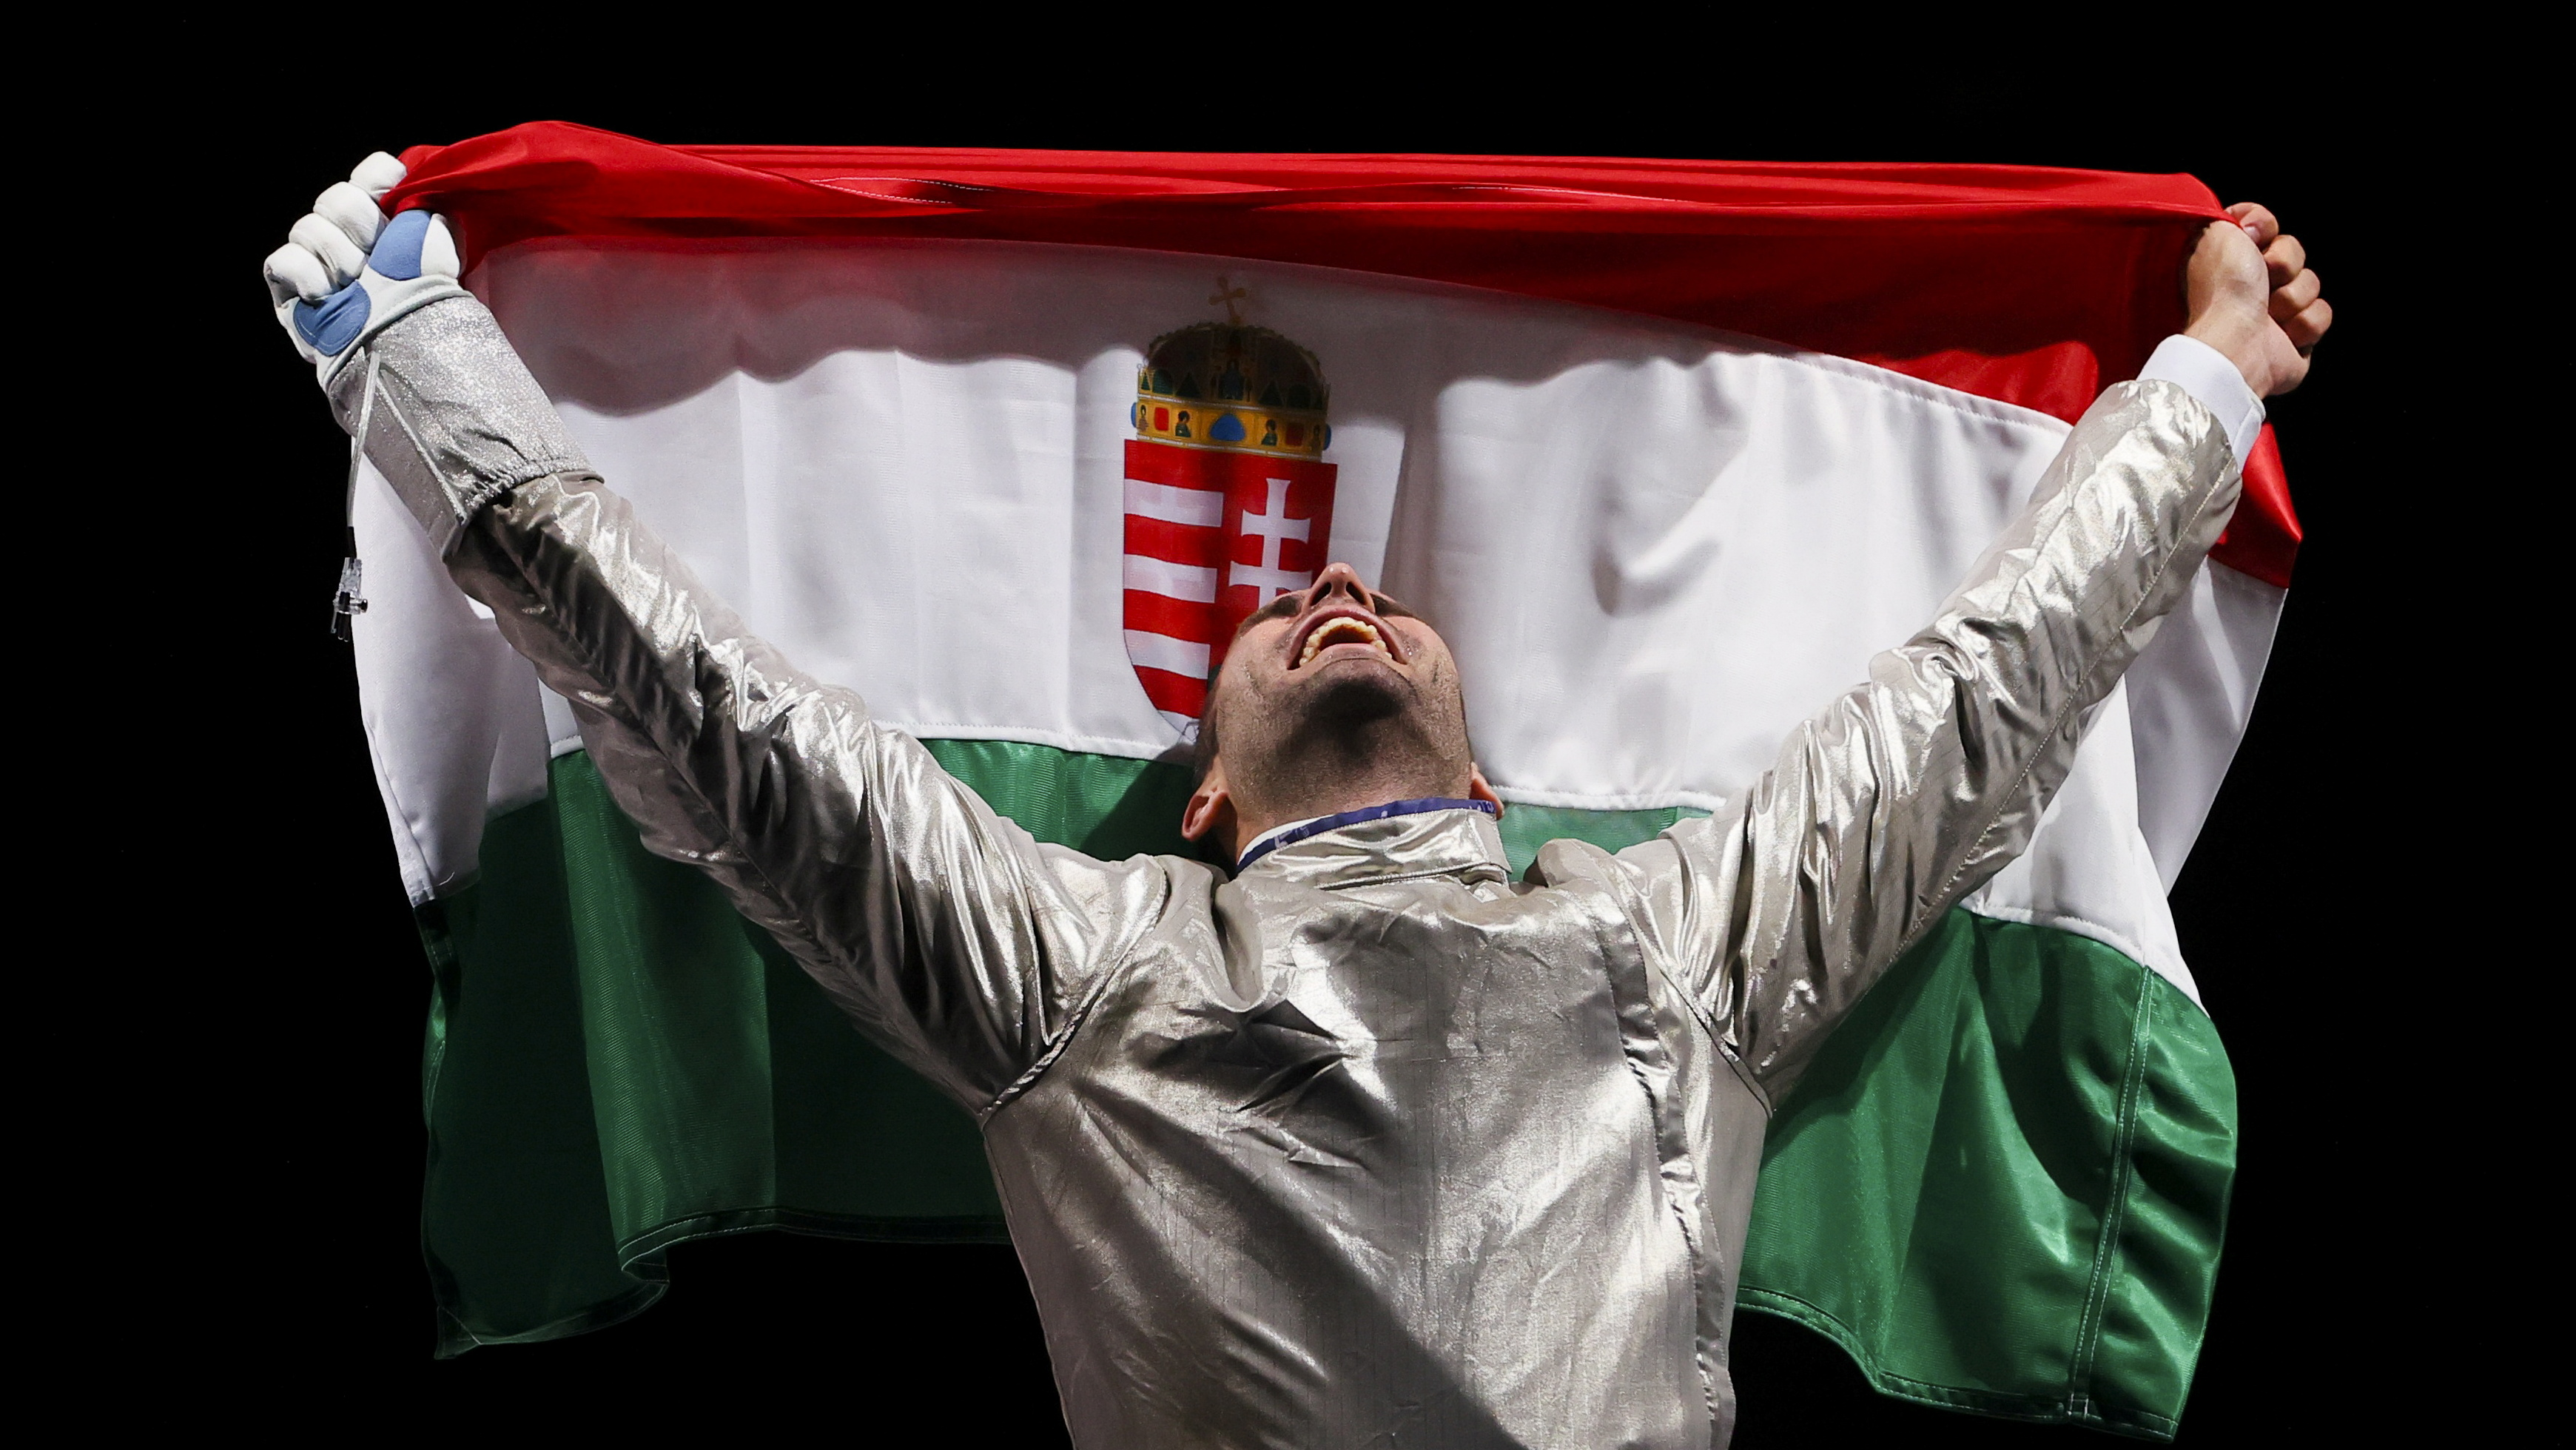 Tokyo 2020 Olympics - Fencing - Men's Individual Sabre - Gold medal match - Makuhari Messe Hall B - Chiba, Japan - July 24, 2021. Aron Szilagyi of Hungary celebrates winning gold as he holds the flag of Hungary REUTERS/Maxim Shemetov